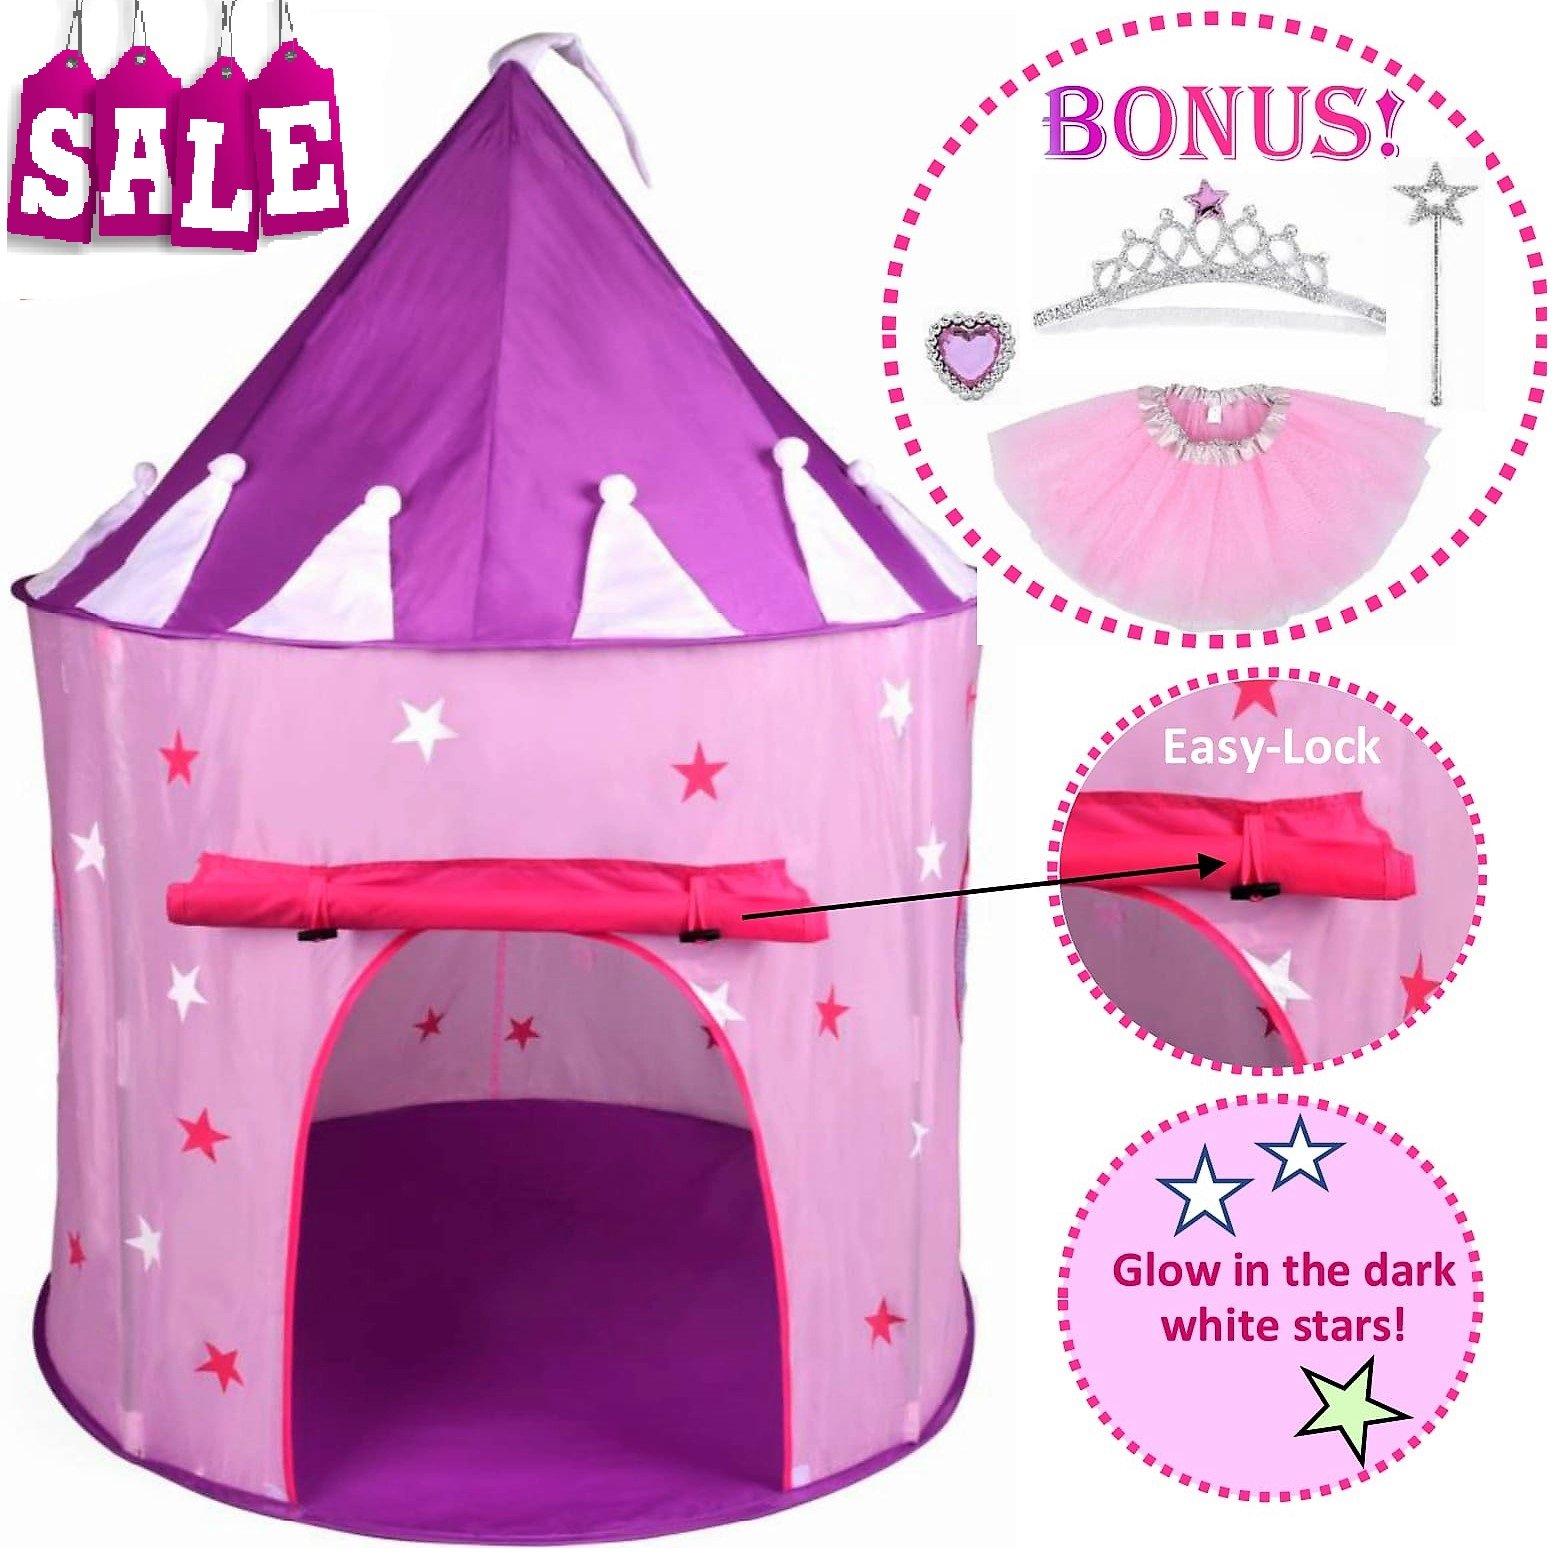 Hide N Side 5pc Princess Tent for Girls Play Tent Princess Castle w Glow in The Dark Stars. Bonus Princess Dress up Tutu Costume Set! Tent for Kids Children Princess Pink Play-House Pop Up Tent